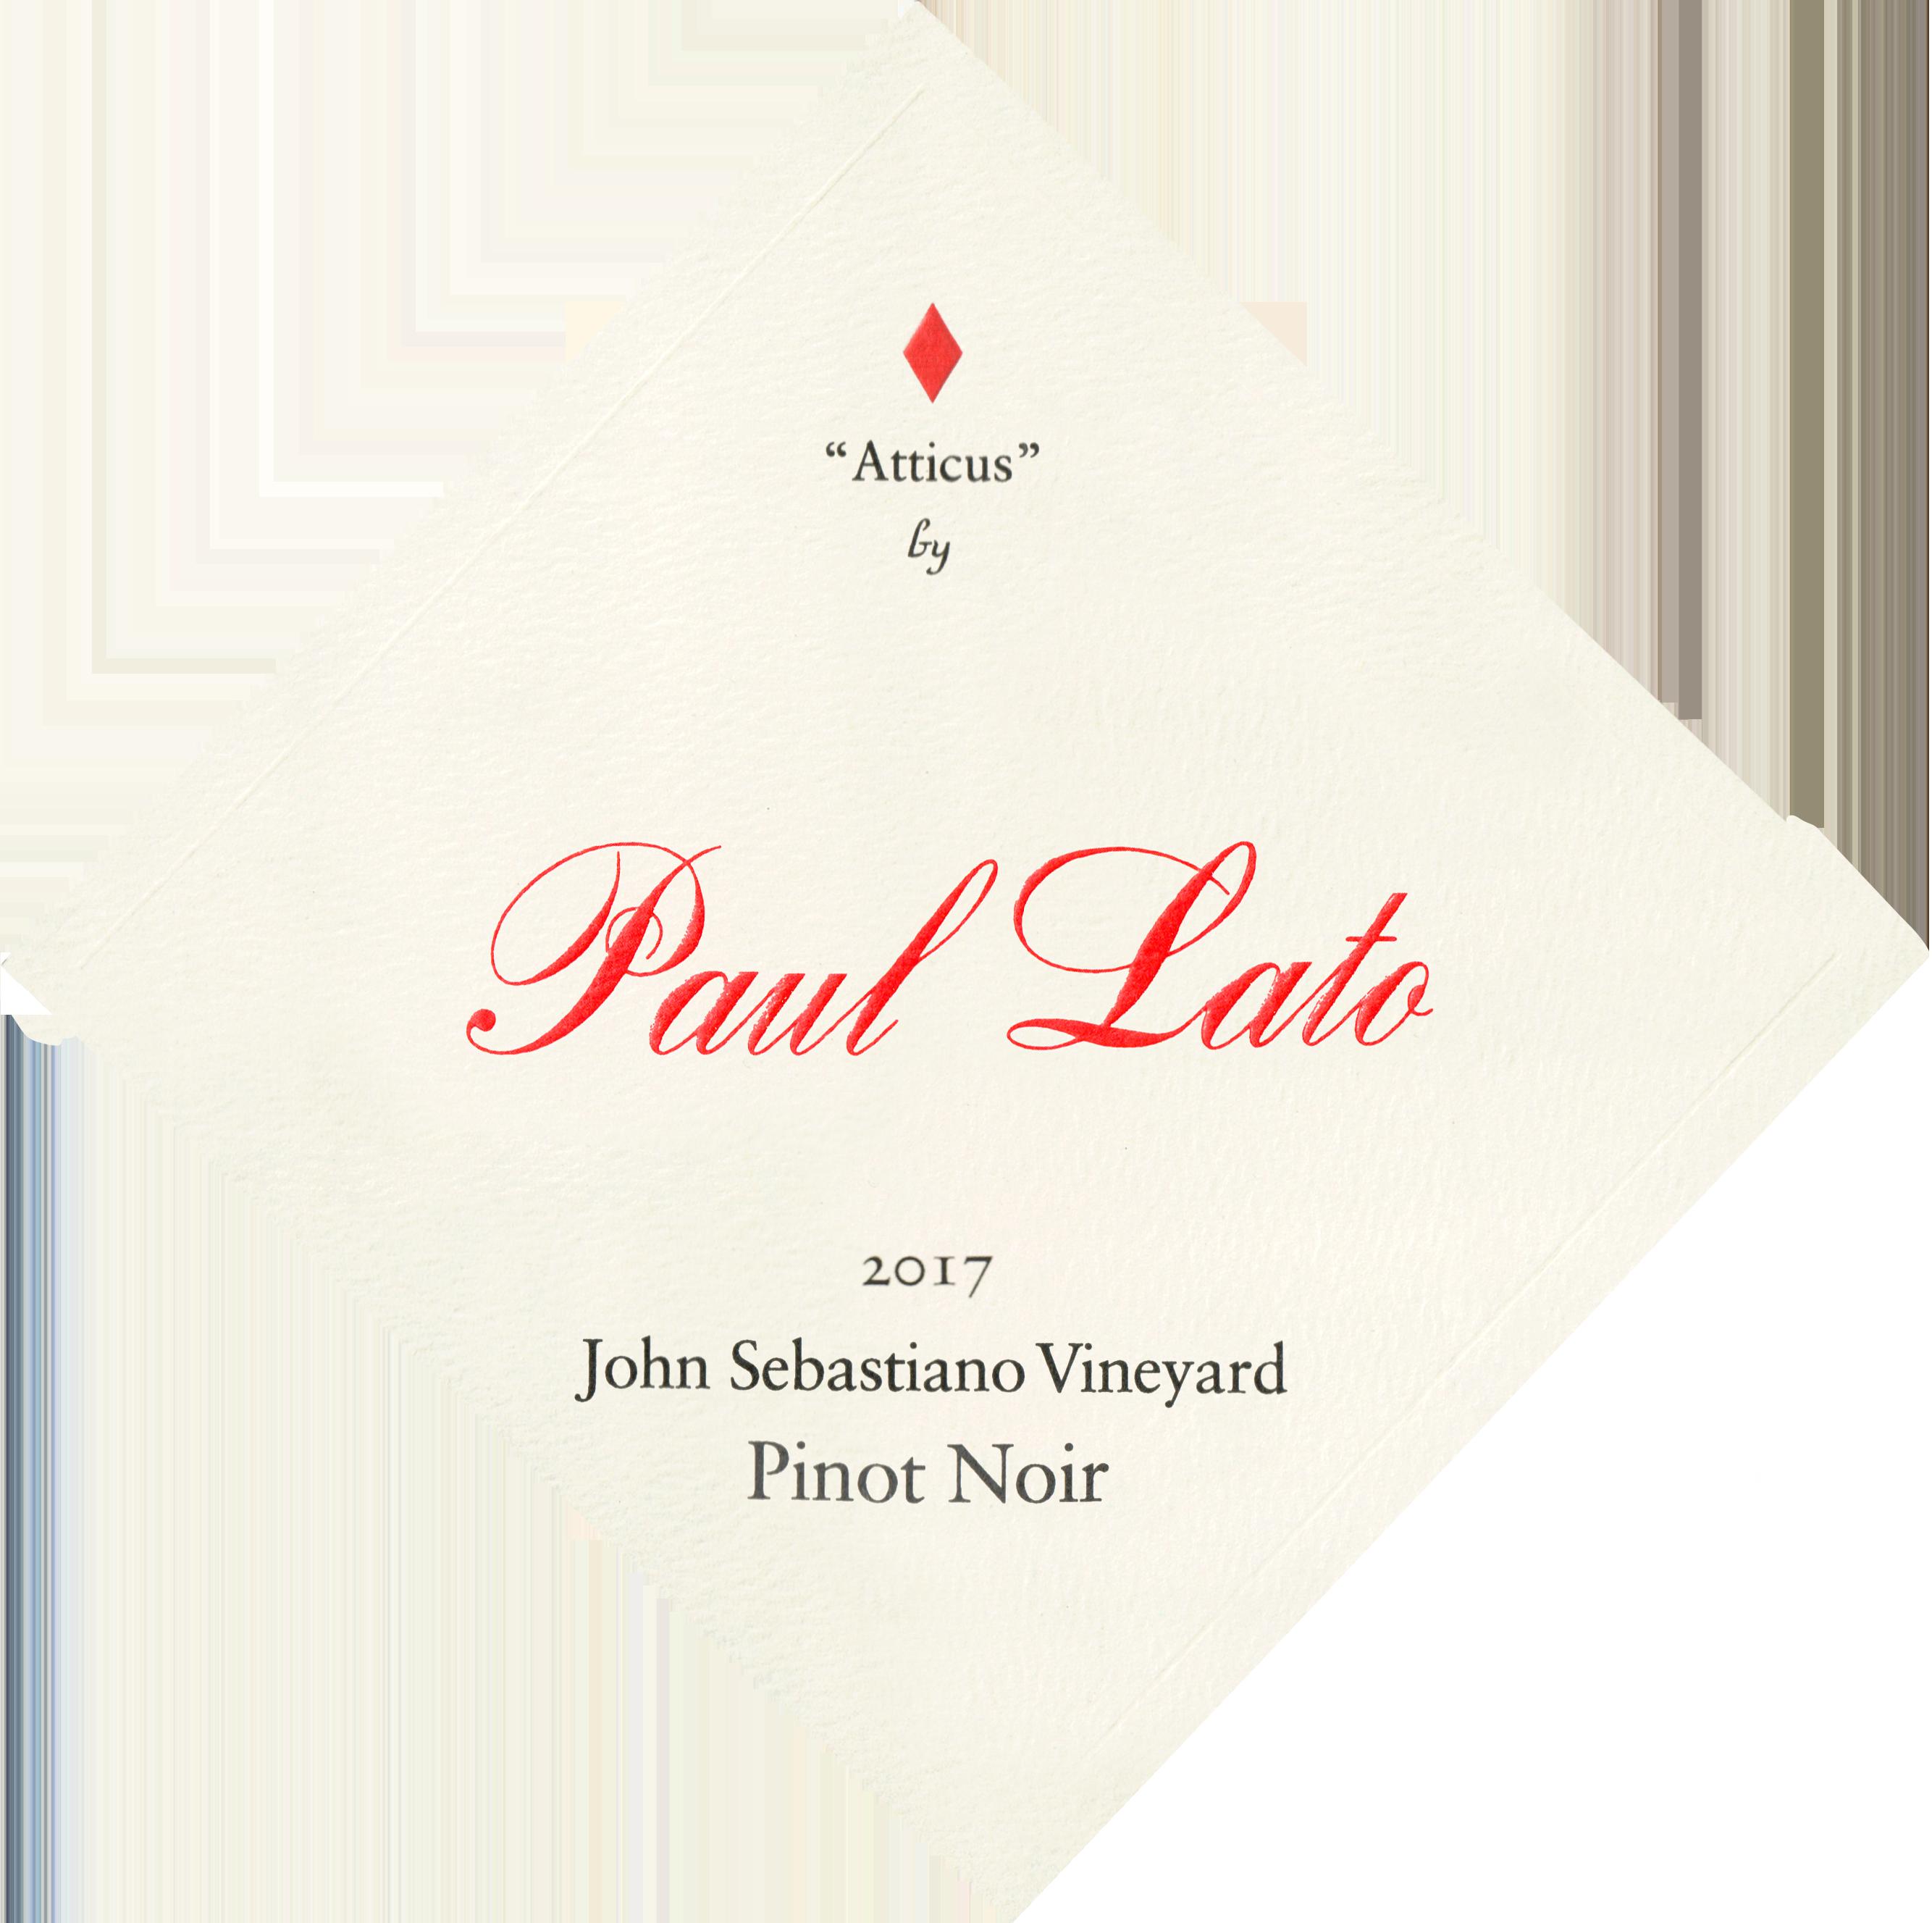 Paul Lato Atticus Sebastiano Vineyard Pinot Noir 2017